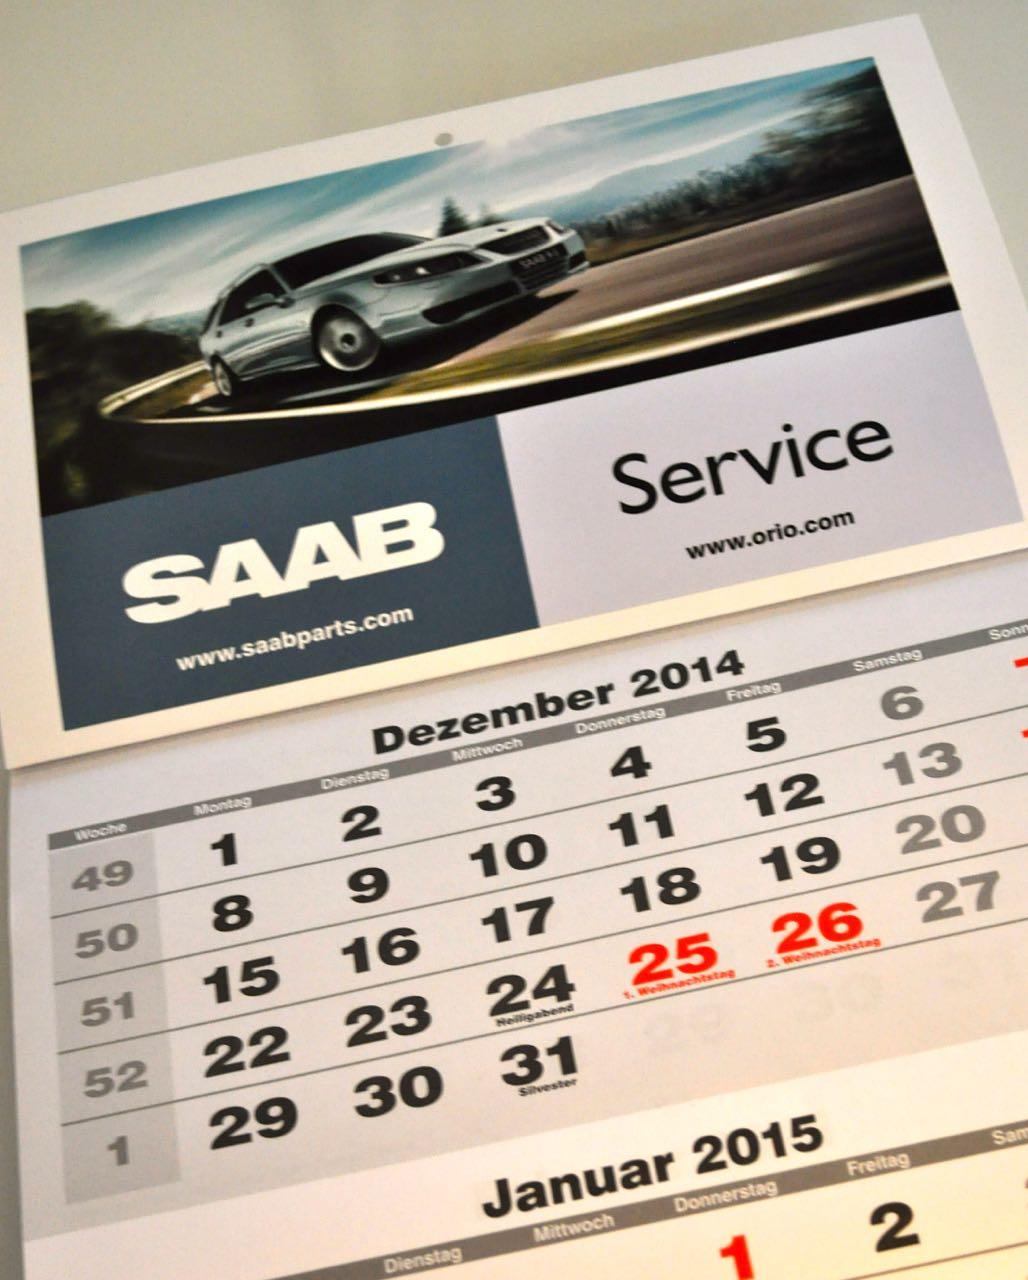 Saab-kalender 2015 van de Orio Germany GmbH